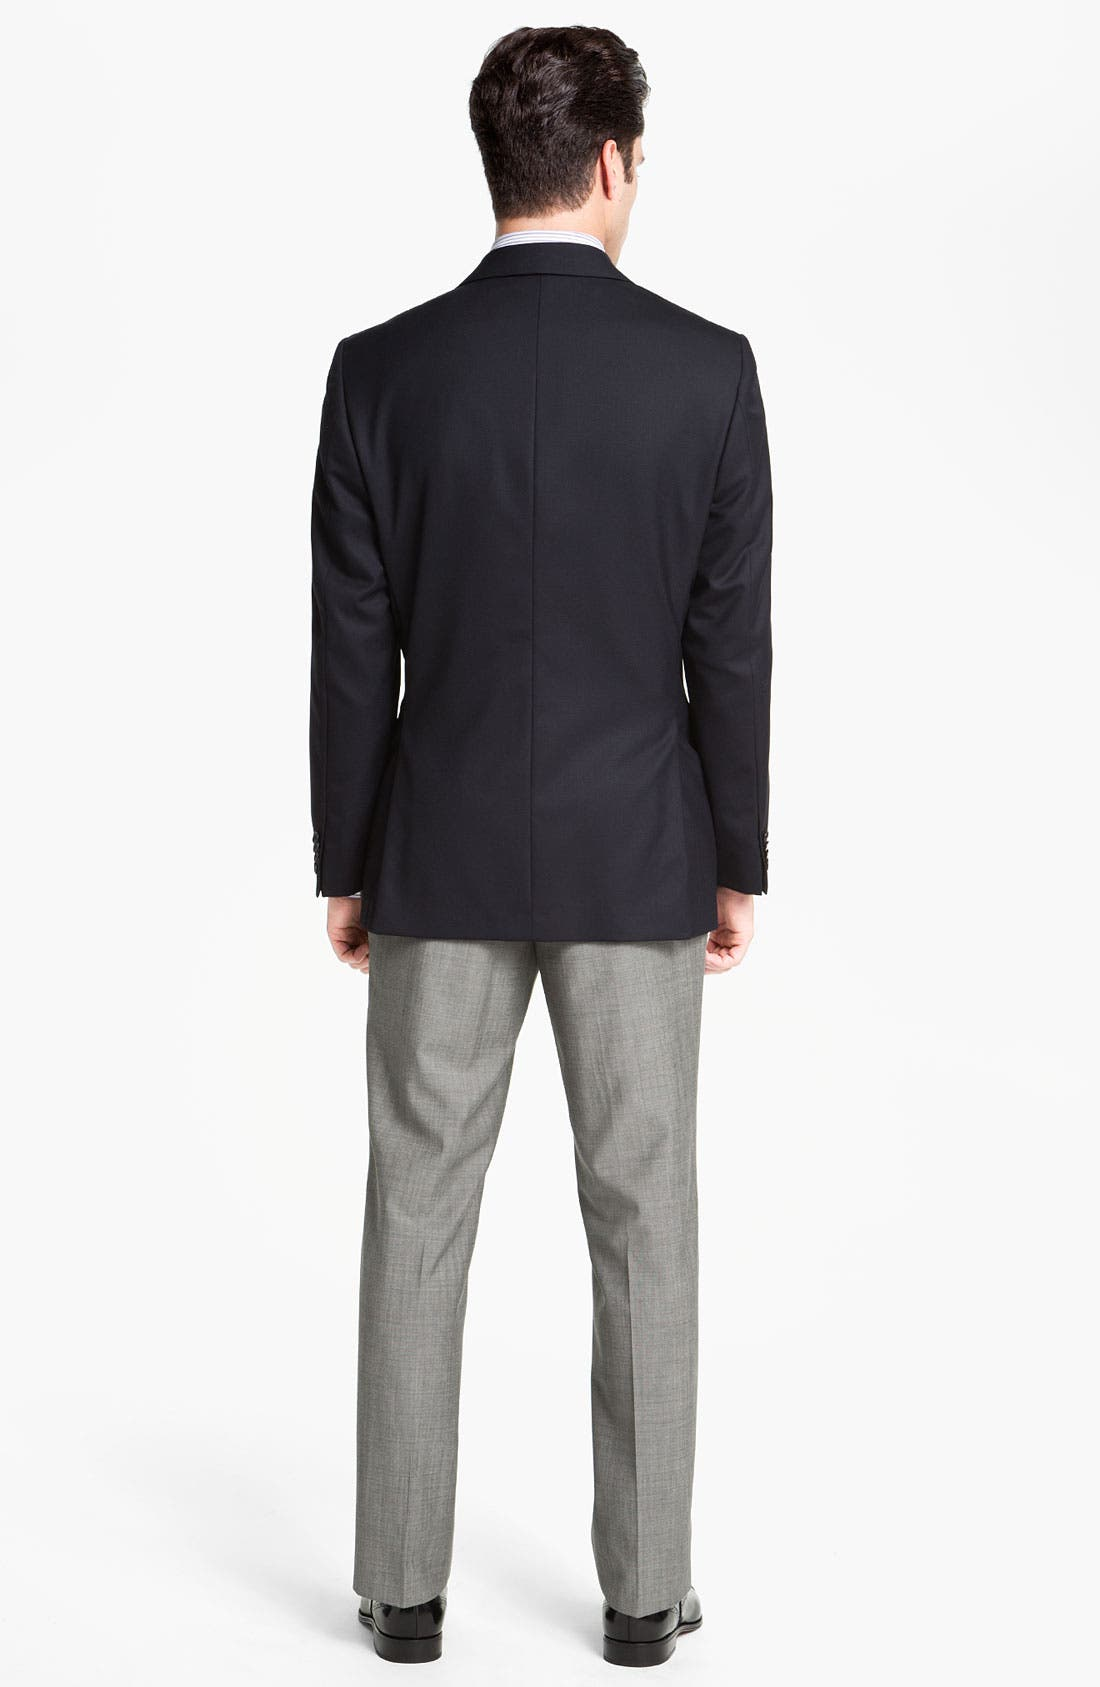 BOSS HUGO BOSS 'Jeffrey US' Flat Front Pinpoint Wool Trousers,                             Alternate thumbnail 6, color,                             022